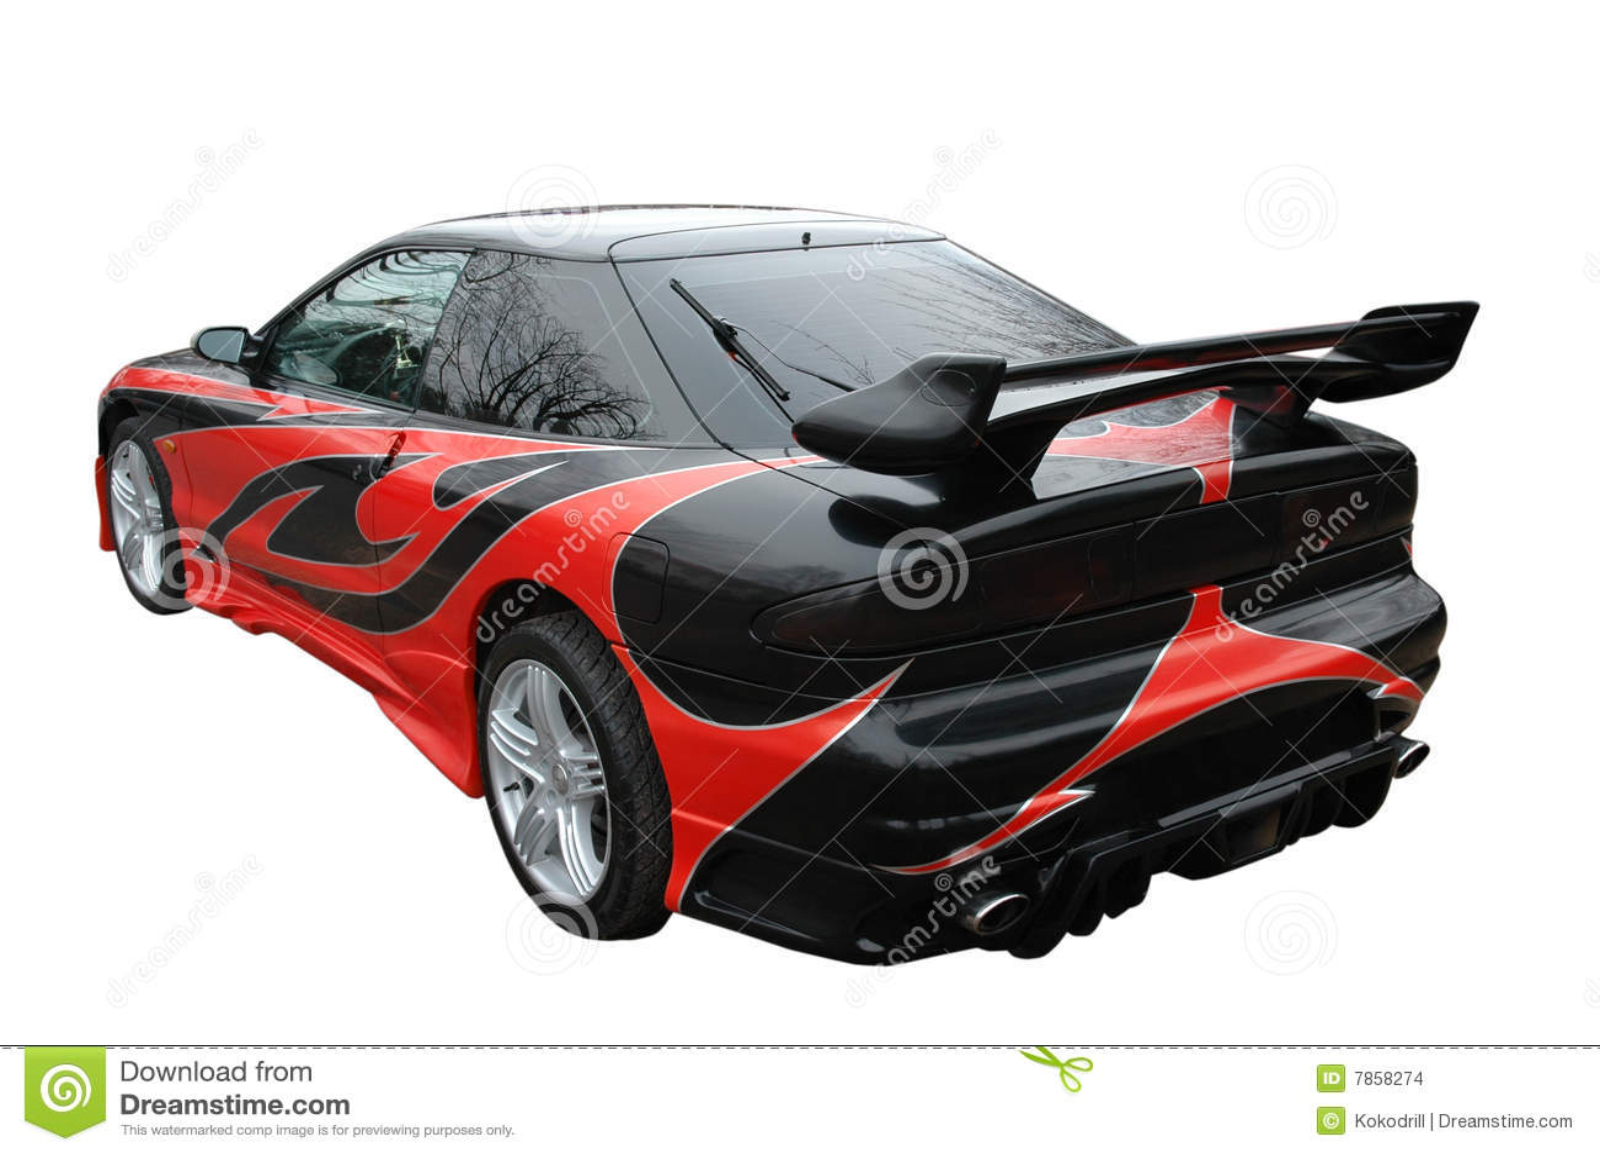 rode en zwarte moderne sport auto stock foto afbeelding bestaande uit modern legering 7858274. Black Bedroom Furniture Sets. Home Design Ideas